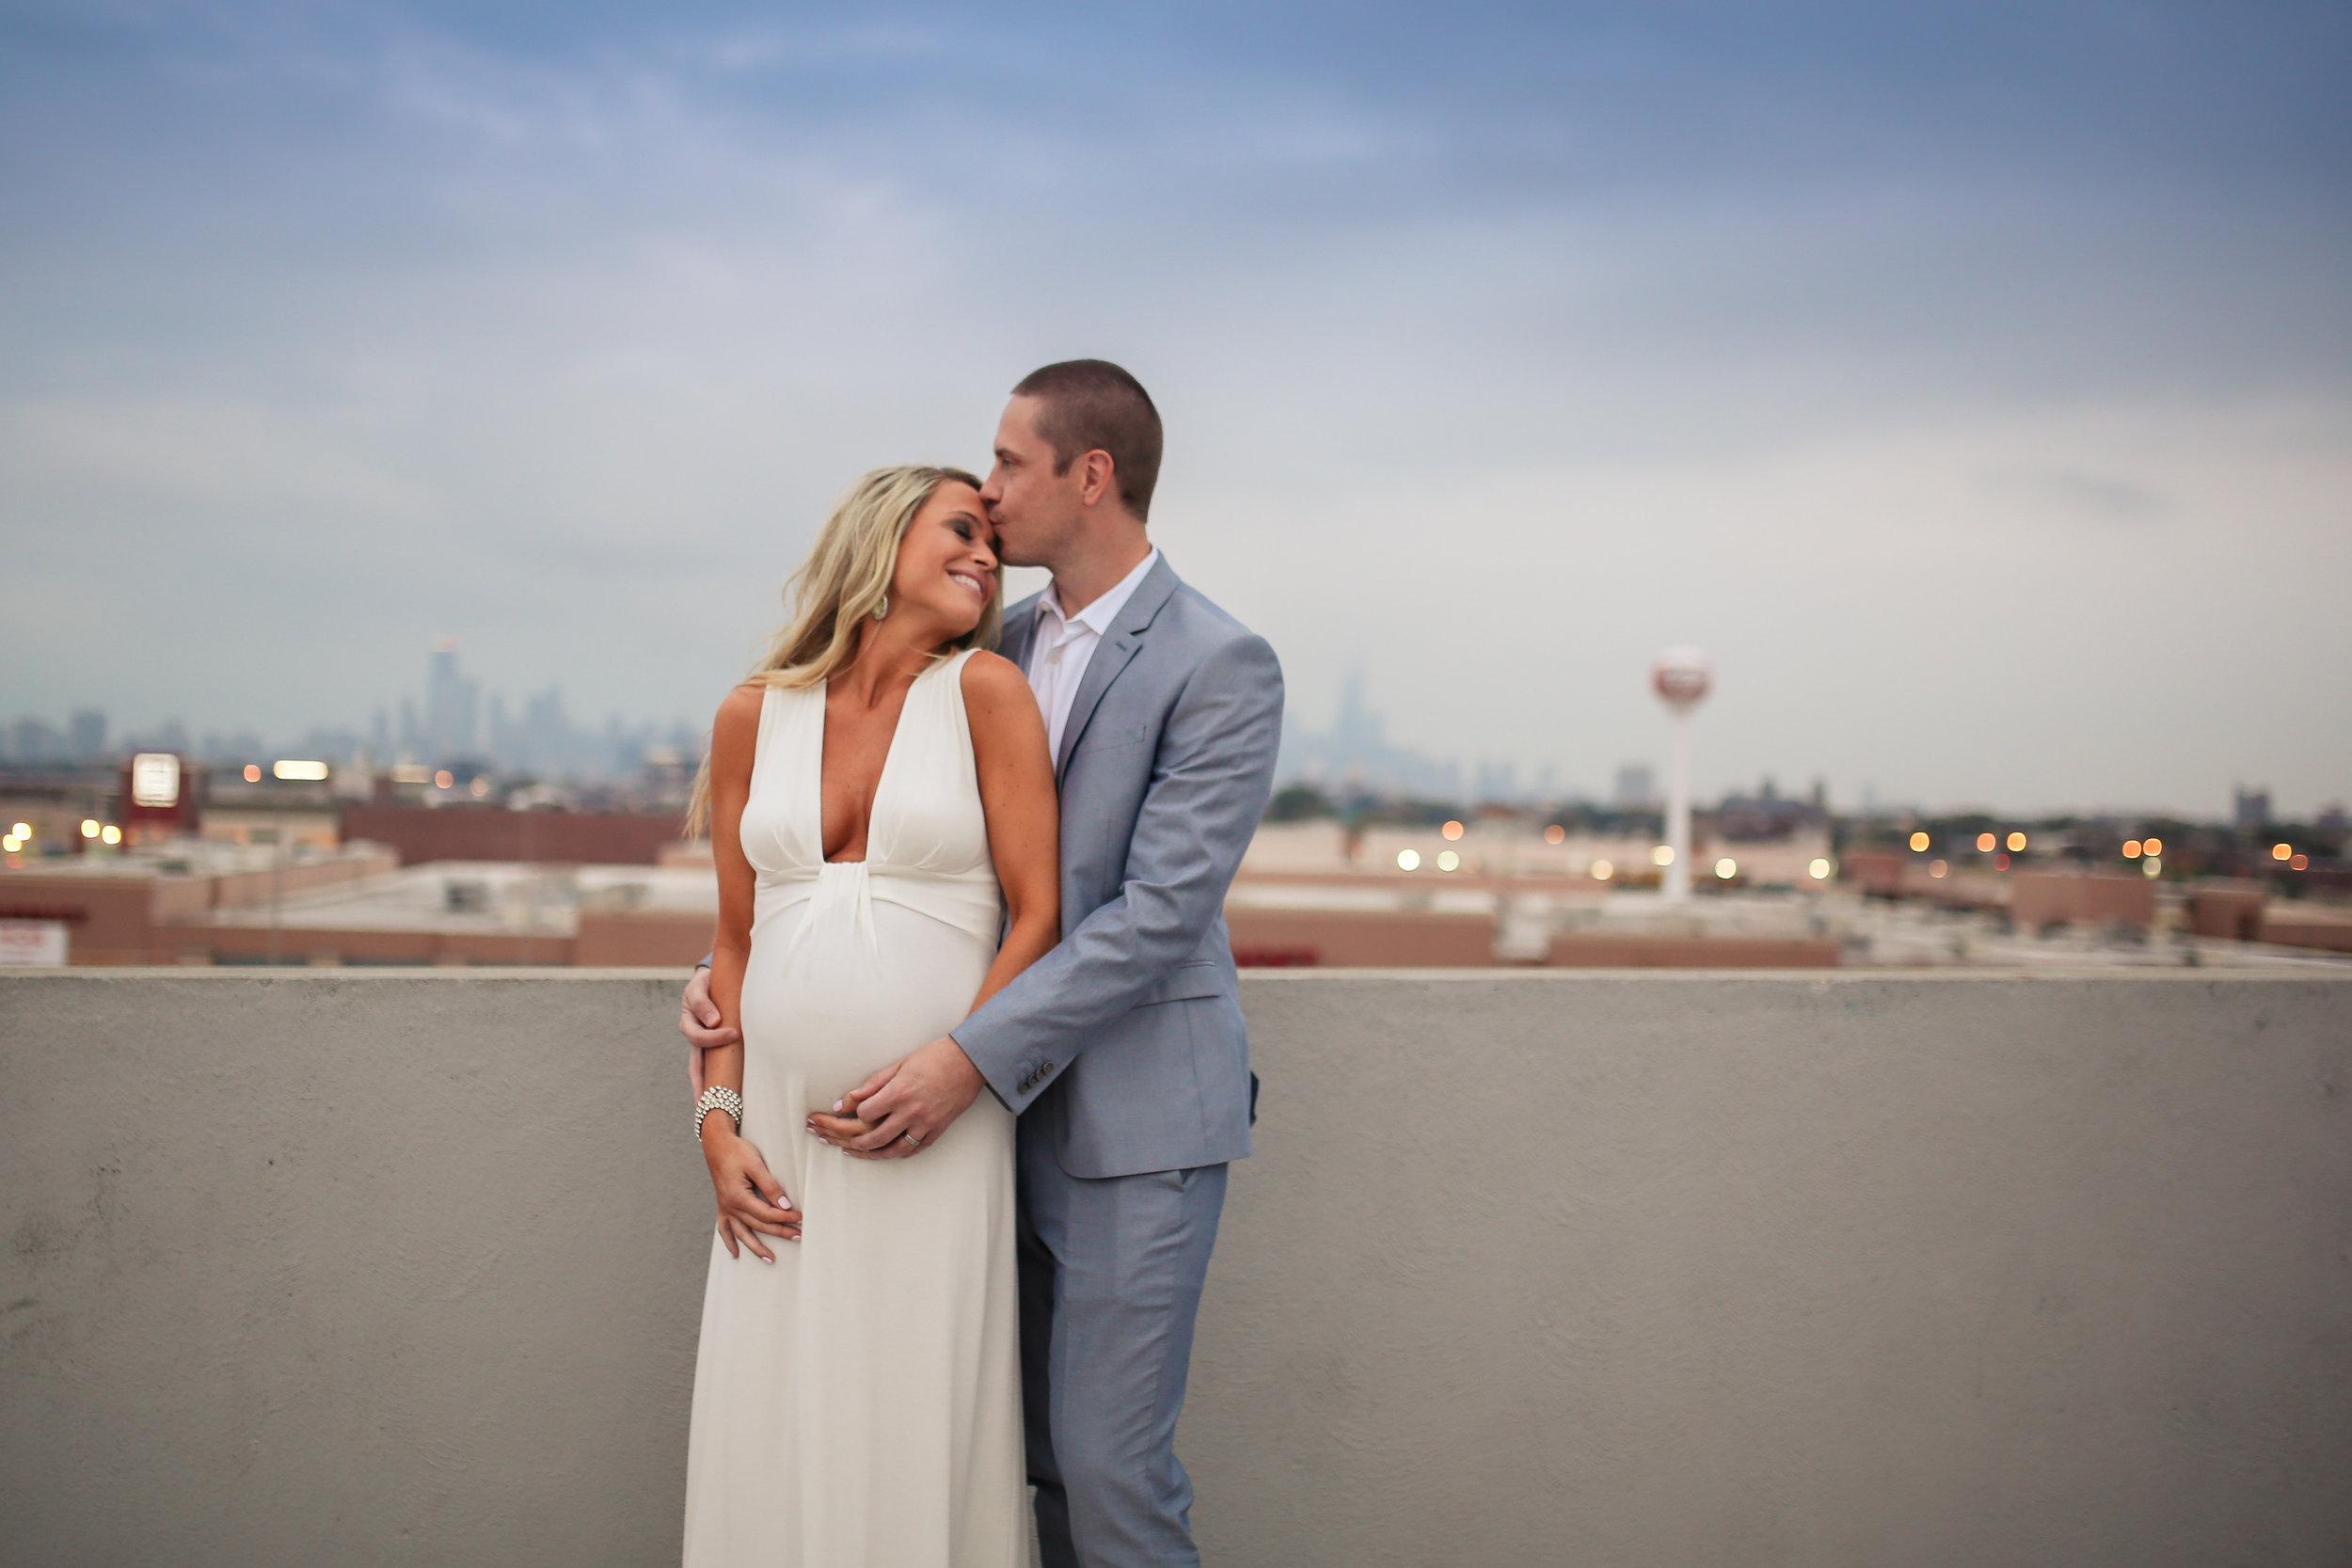 jenny grimm maternity lifestyle photographer chicago